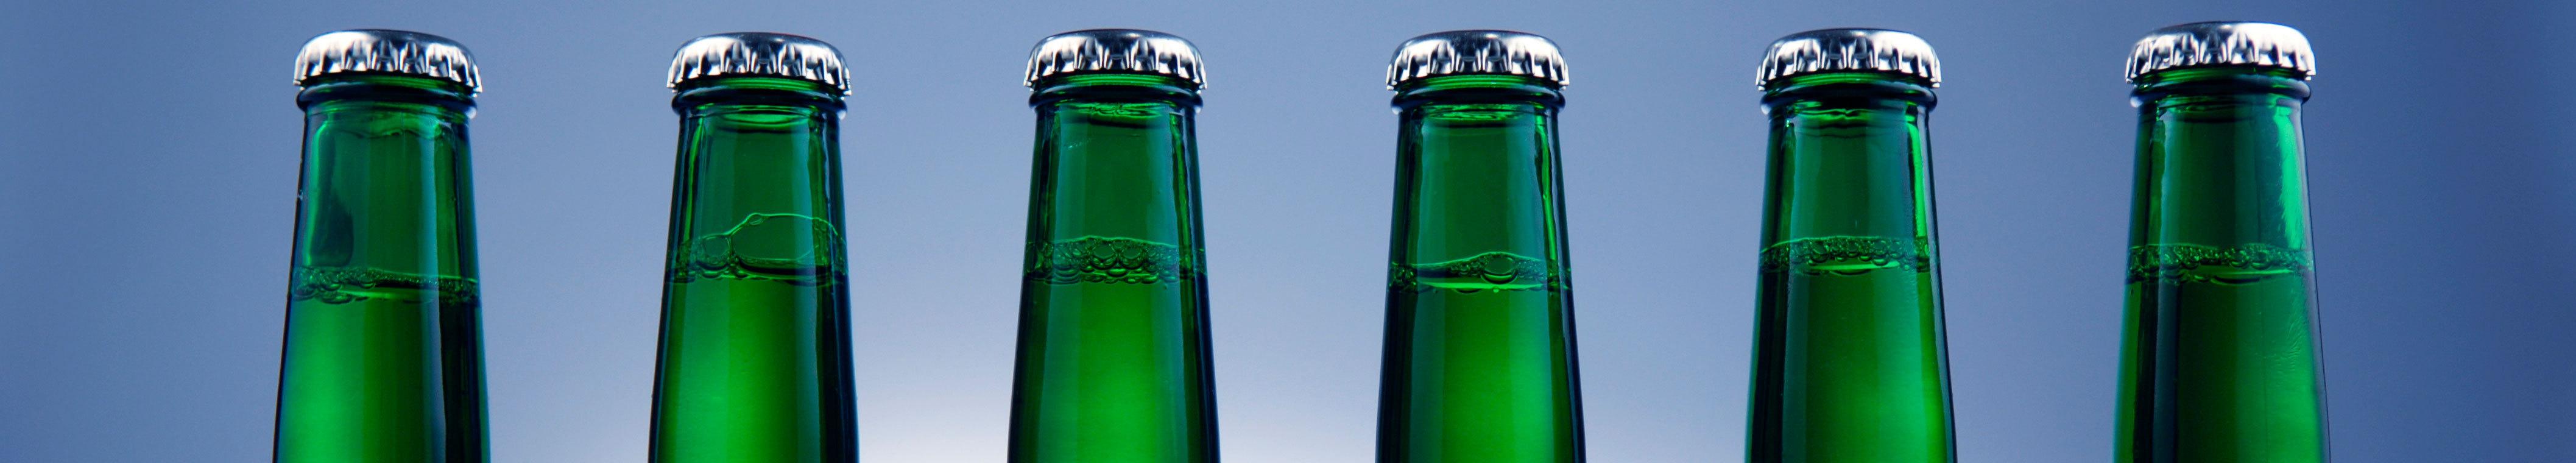 beverage coolers - Beverage Coolers